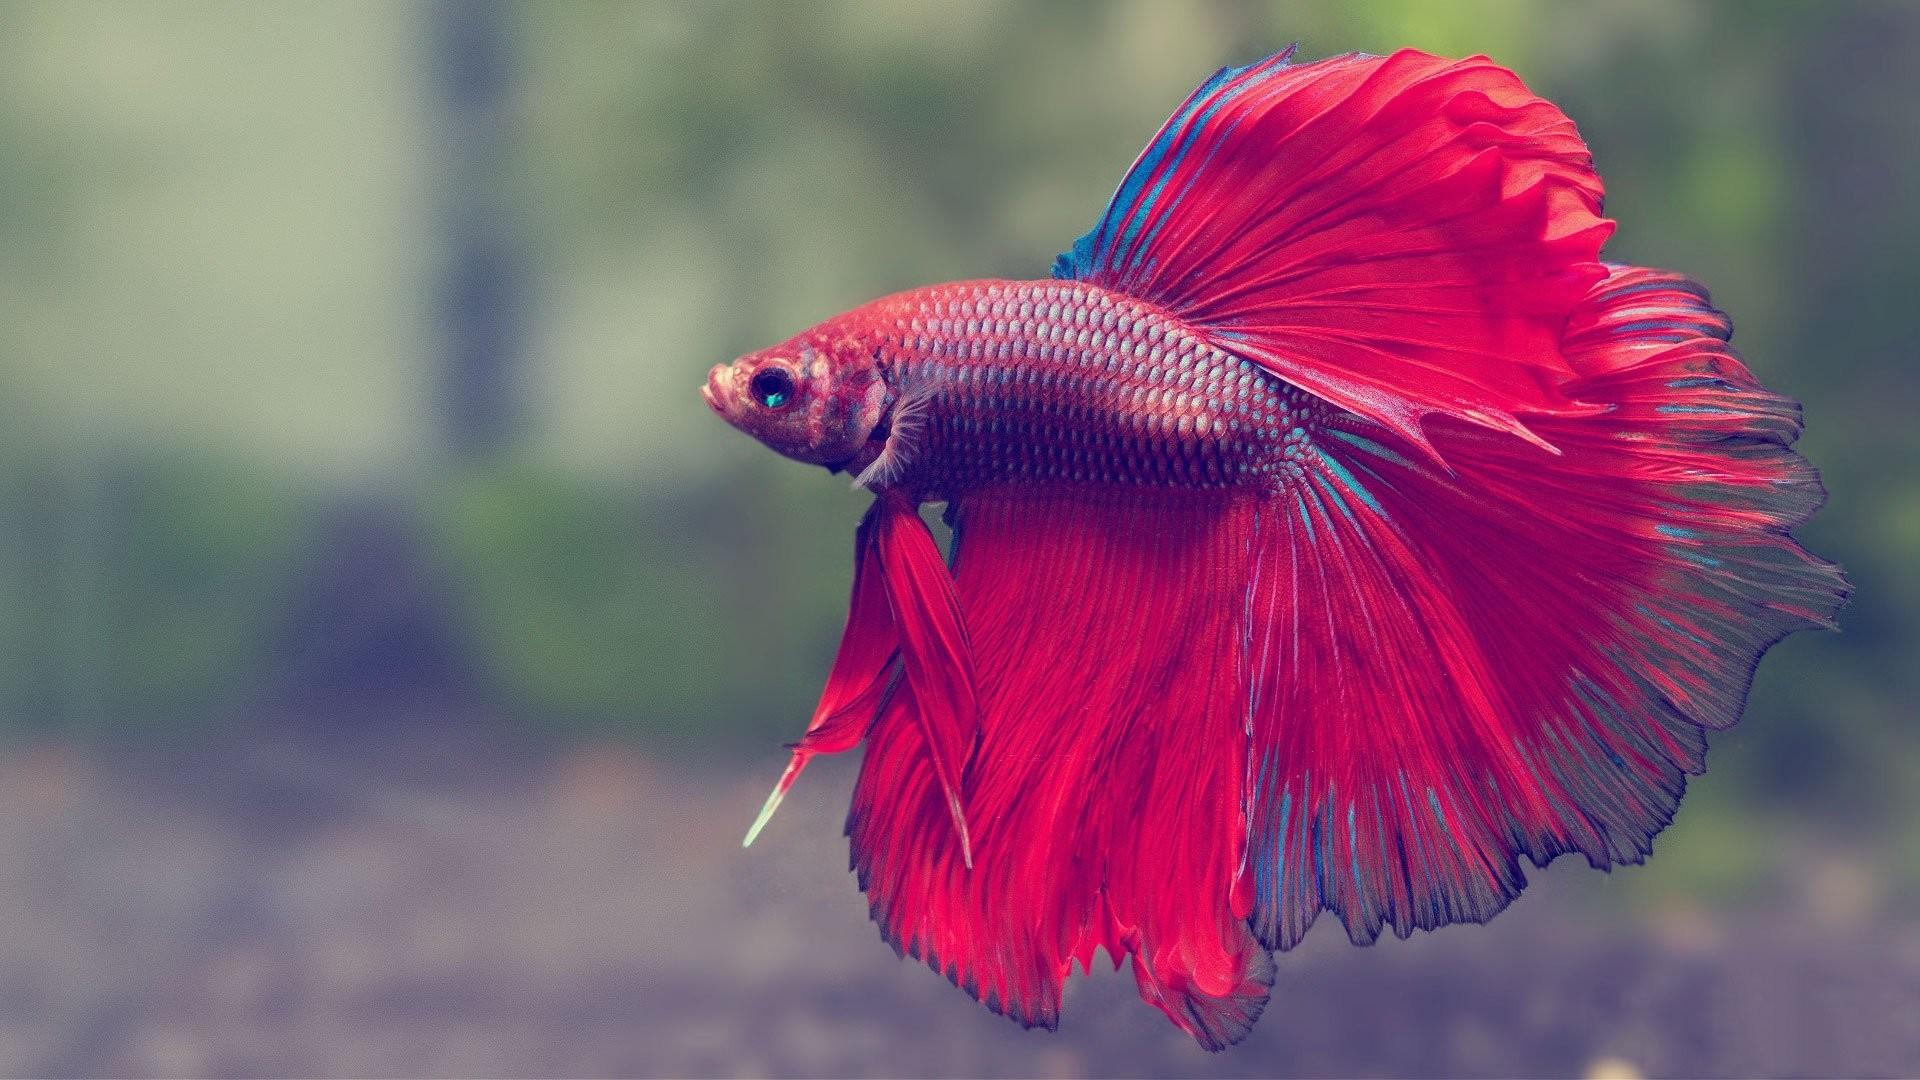 Animated Fish Tank Wallpaper Aquarium Live Wallpaper Windows 10 55 Images